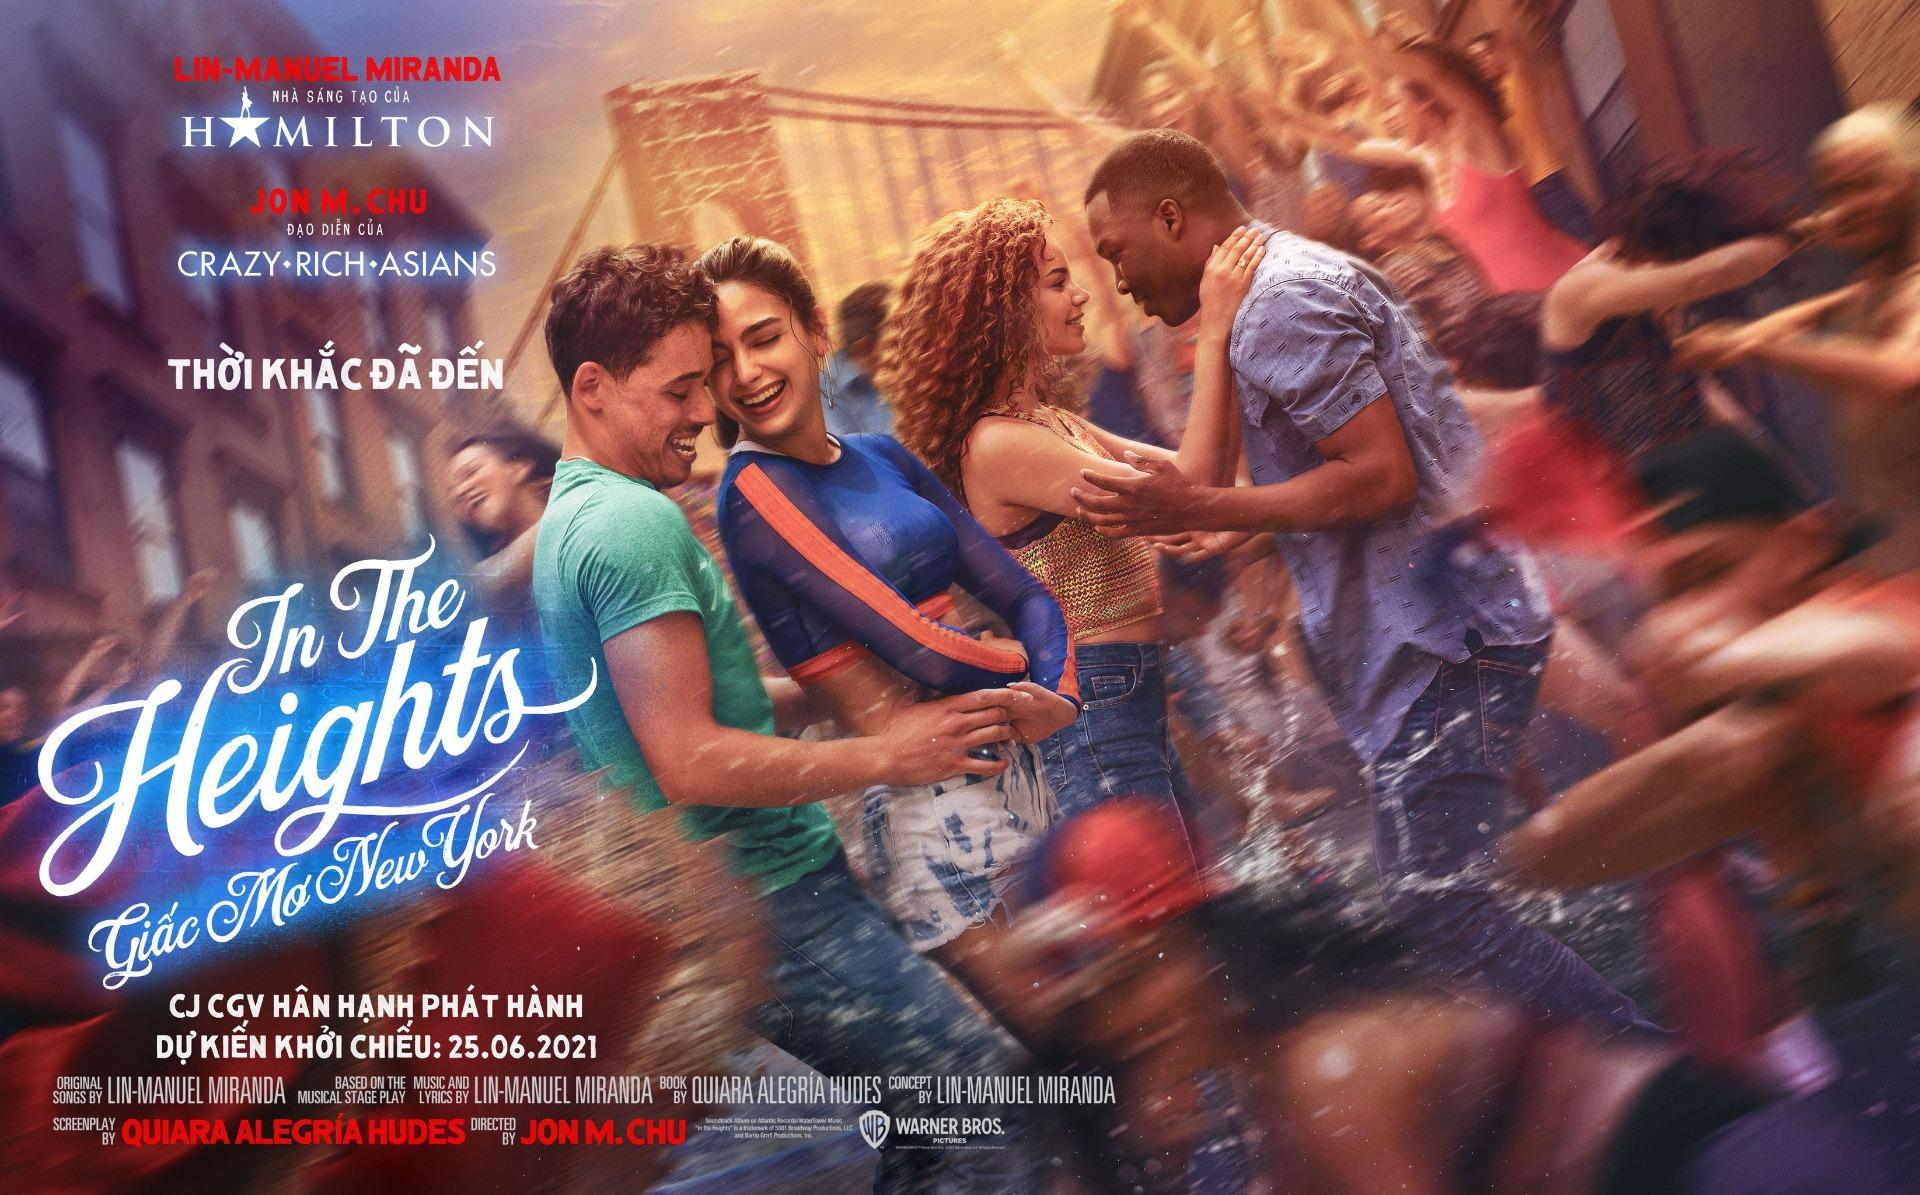 >Opral Winfrey, Hugh Jackman, The Rock, Ariana Grande ... phát cuồng với IN THE HEIGHTS: GIẤC MƠ NEW YORK